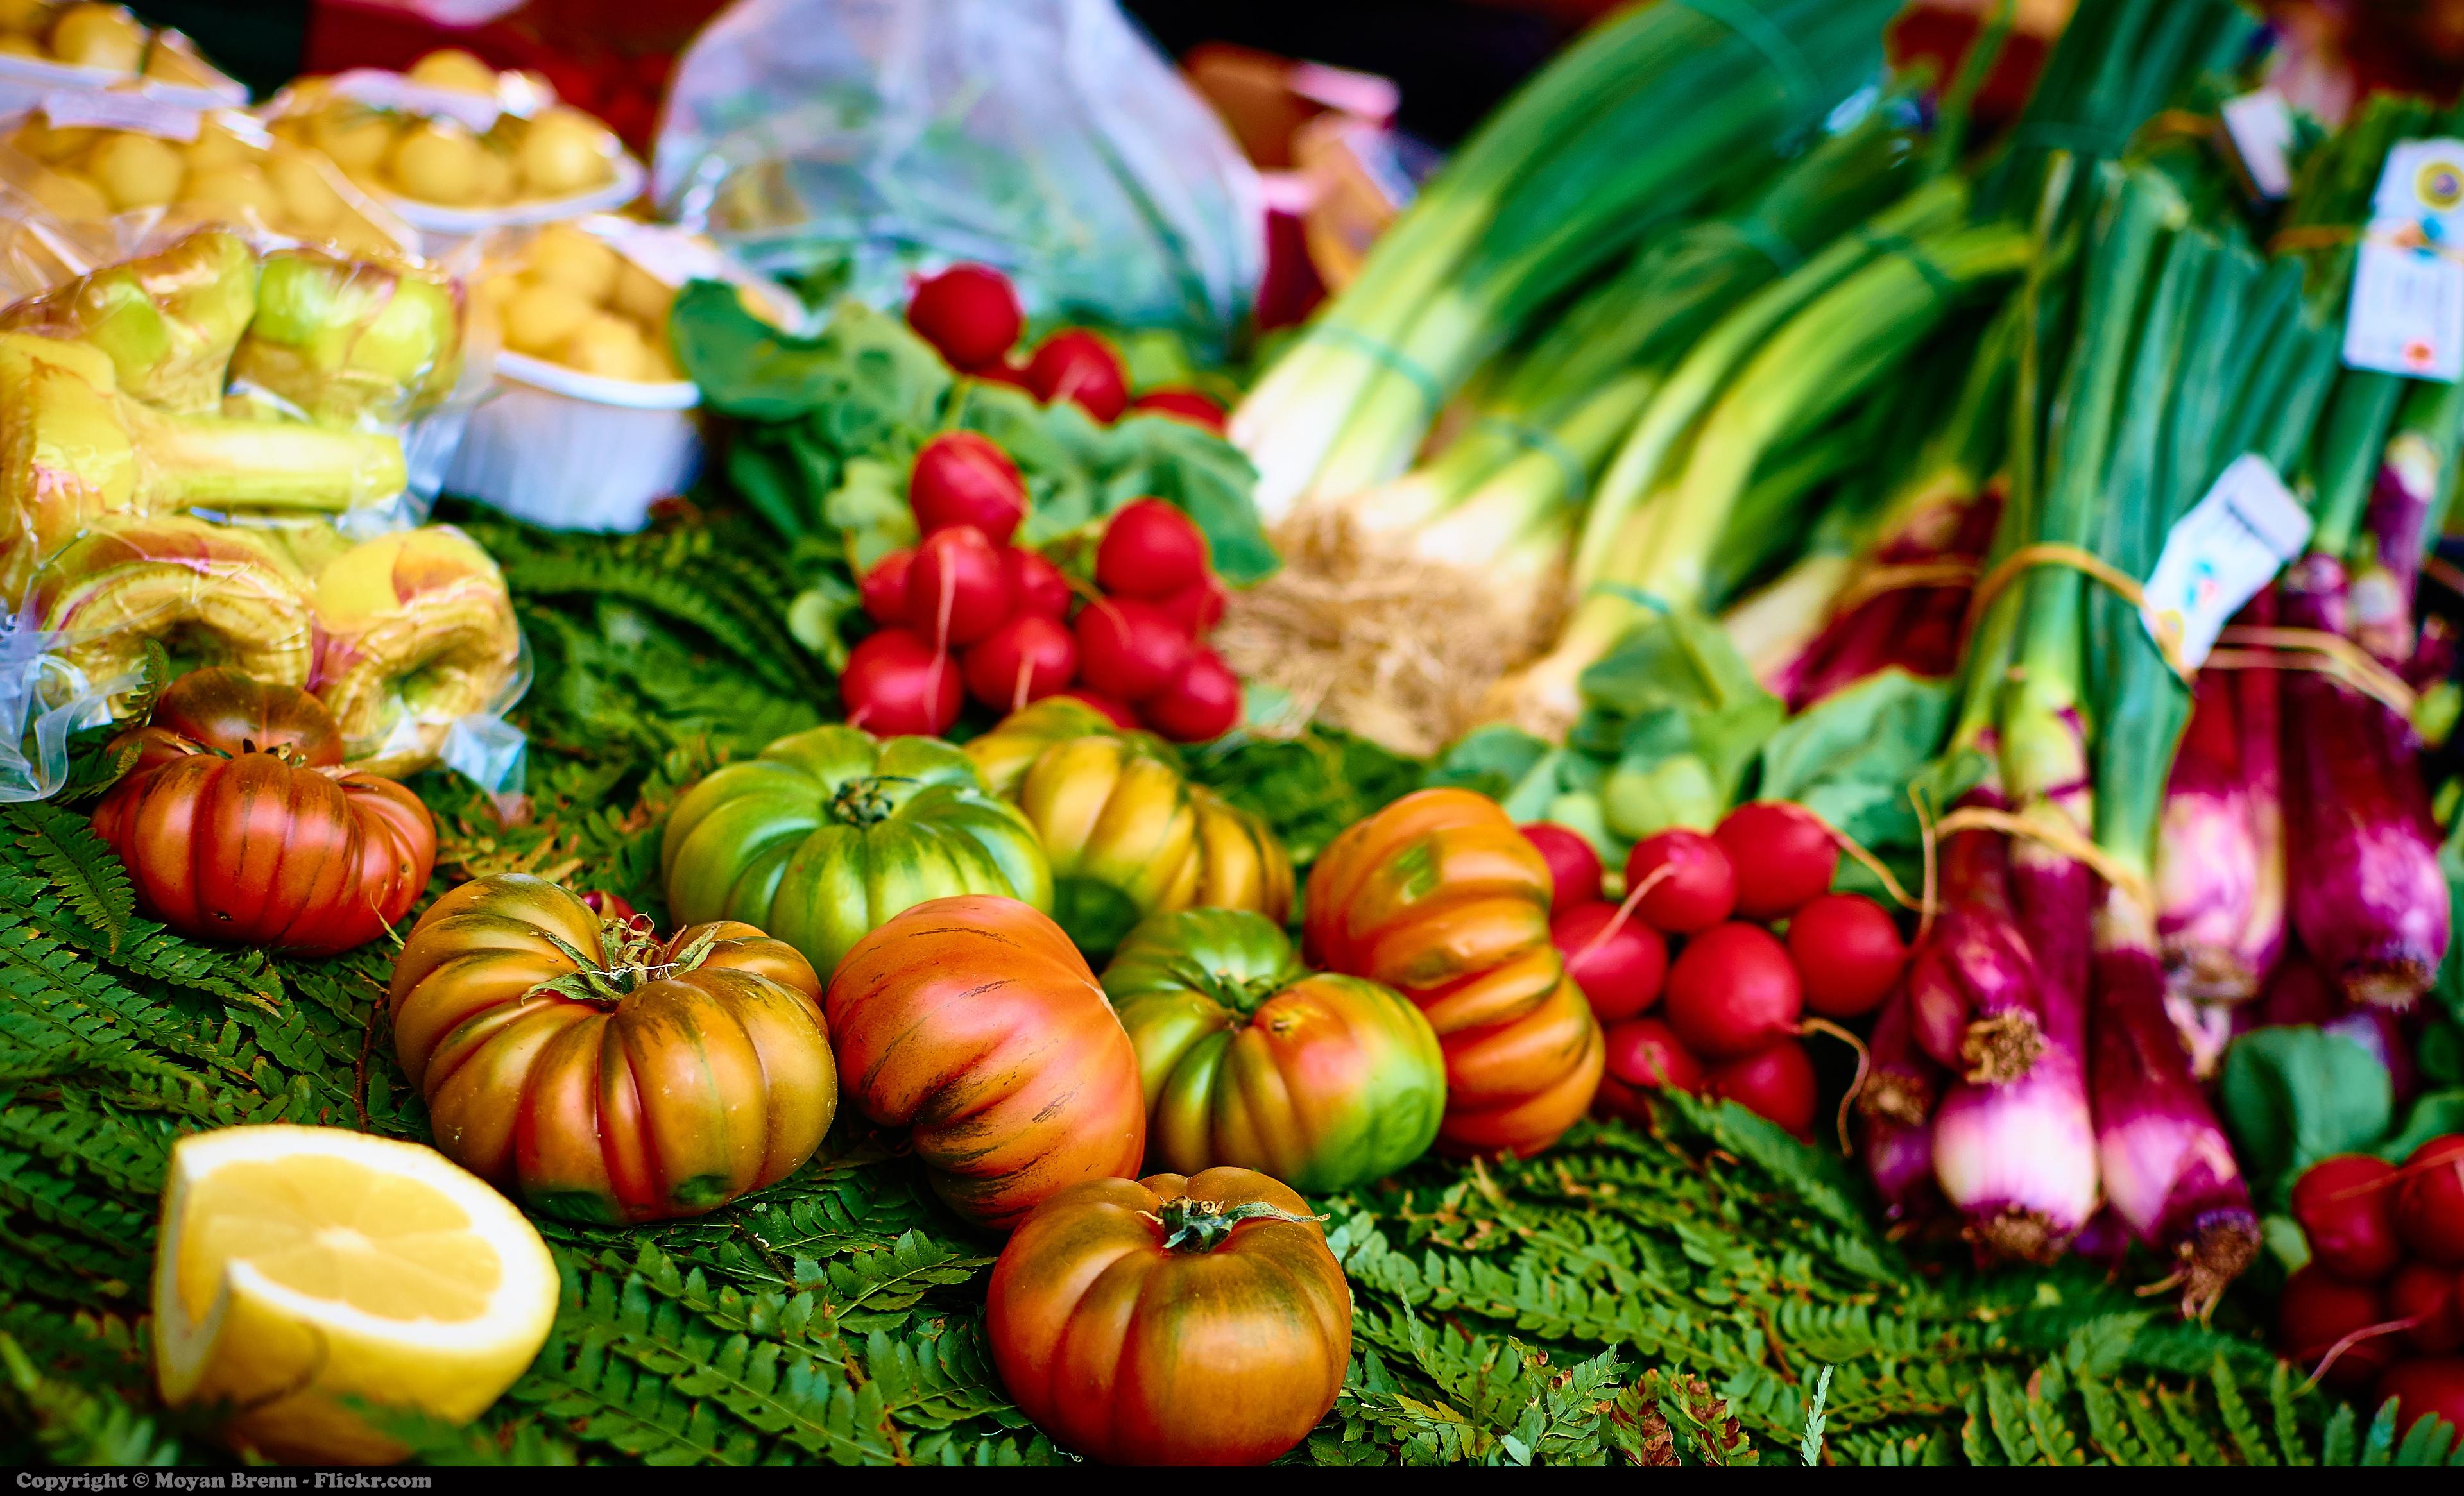 Mediterranean diet and sustainable food habits: the case of Neapolitan children